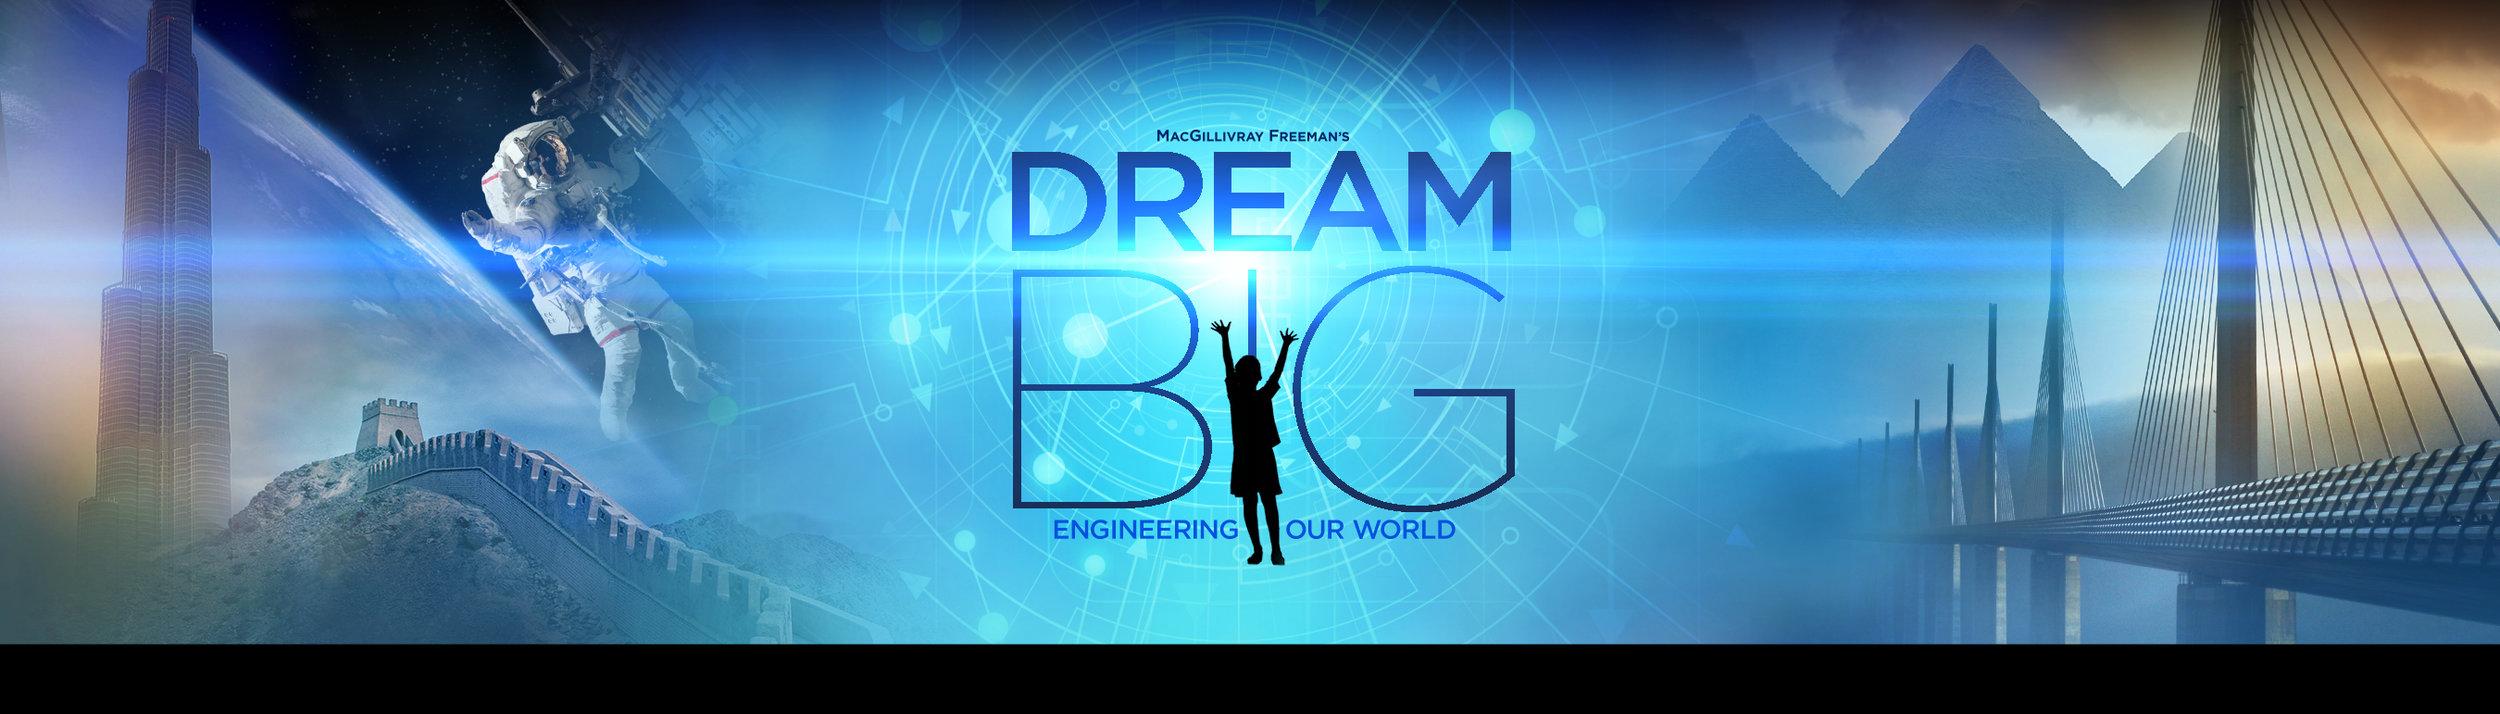 IMAX Film Dream Big Engineering Our World